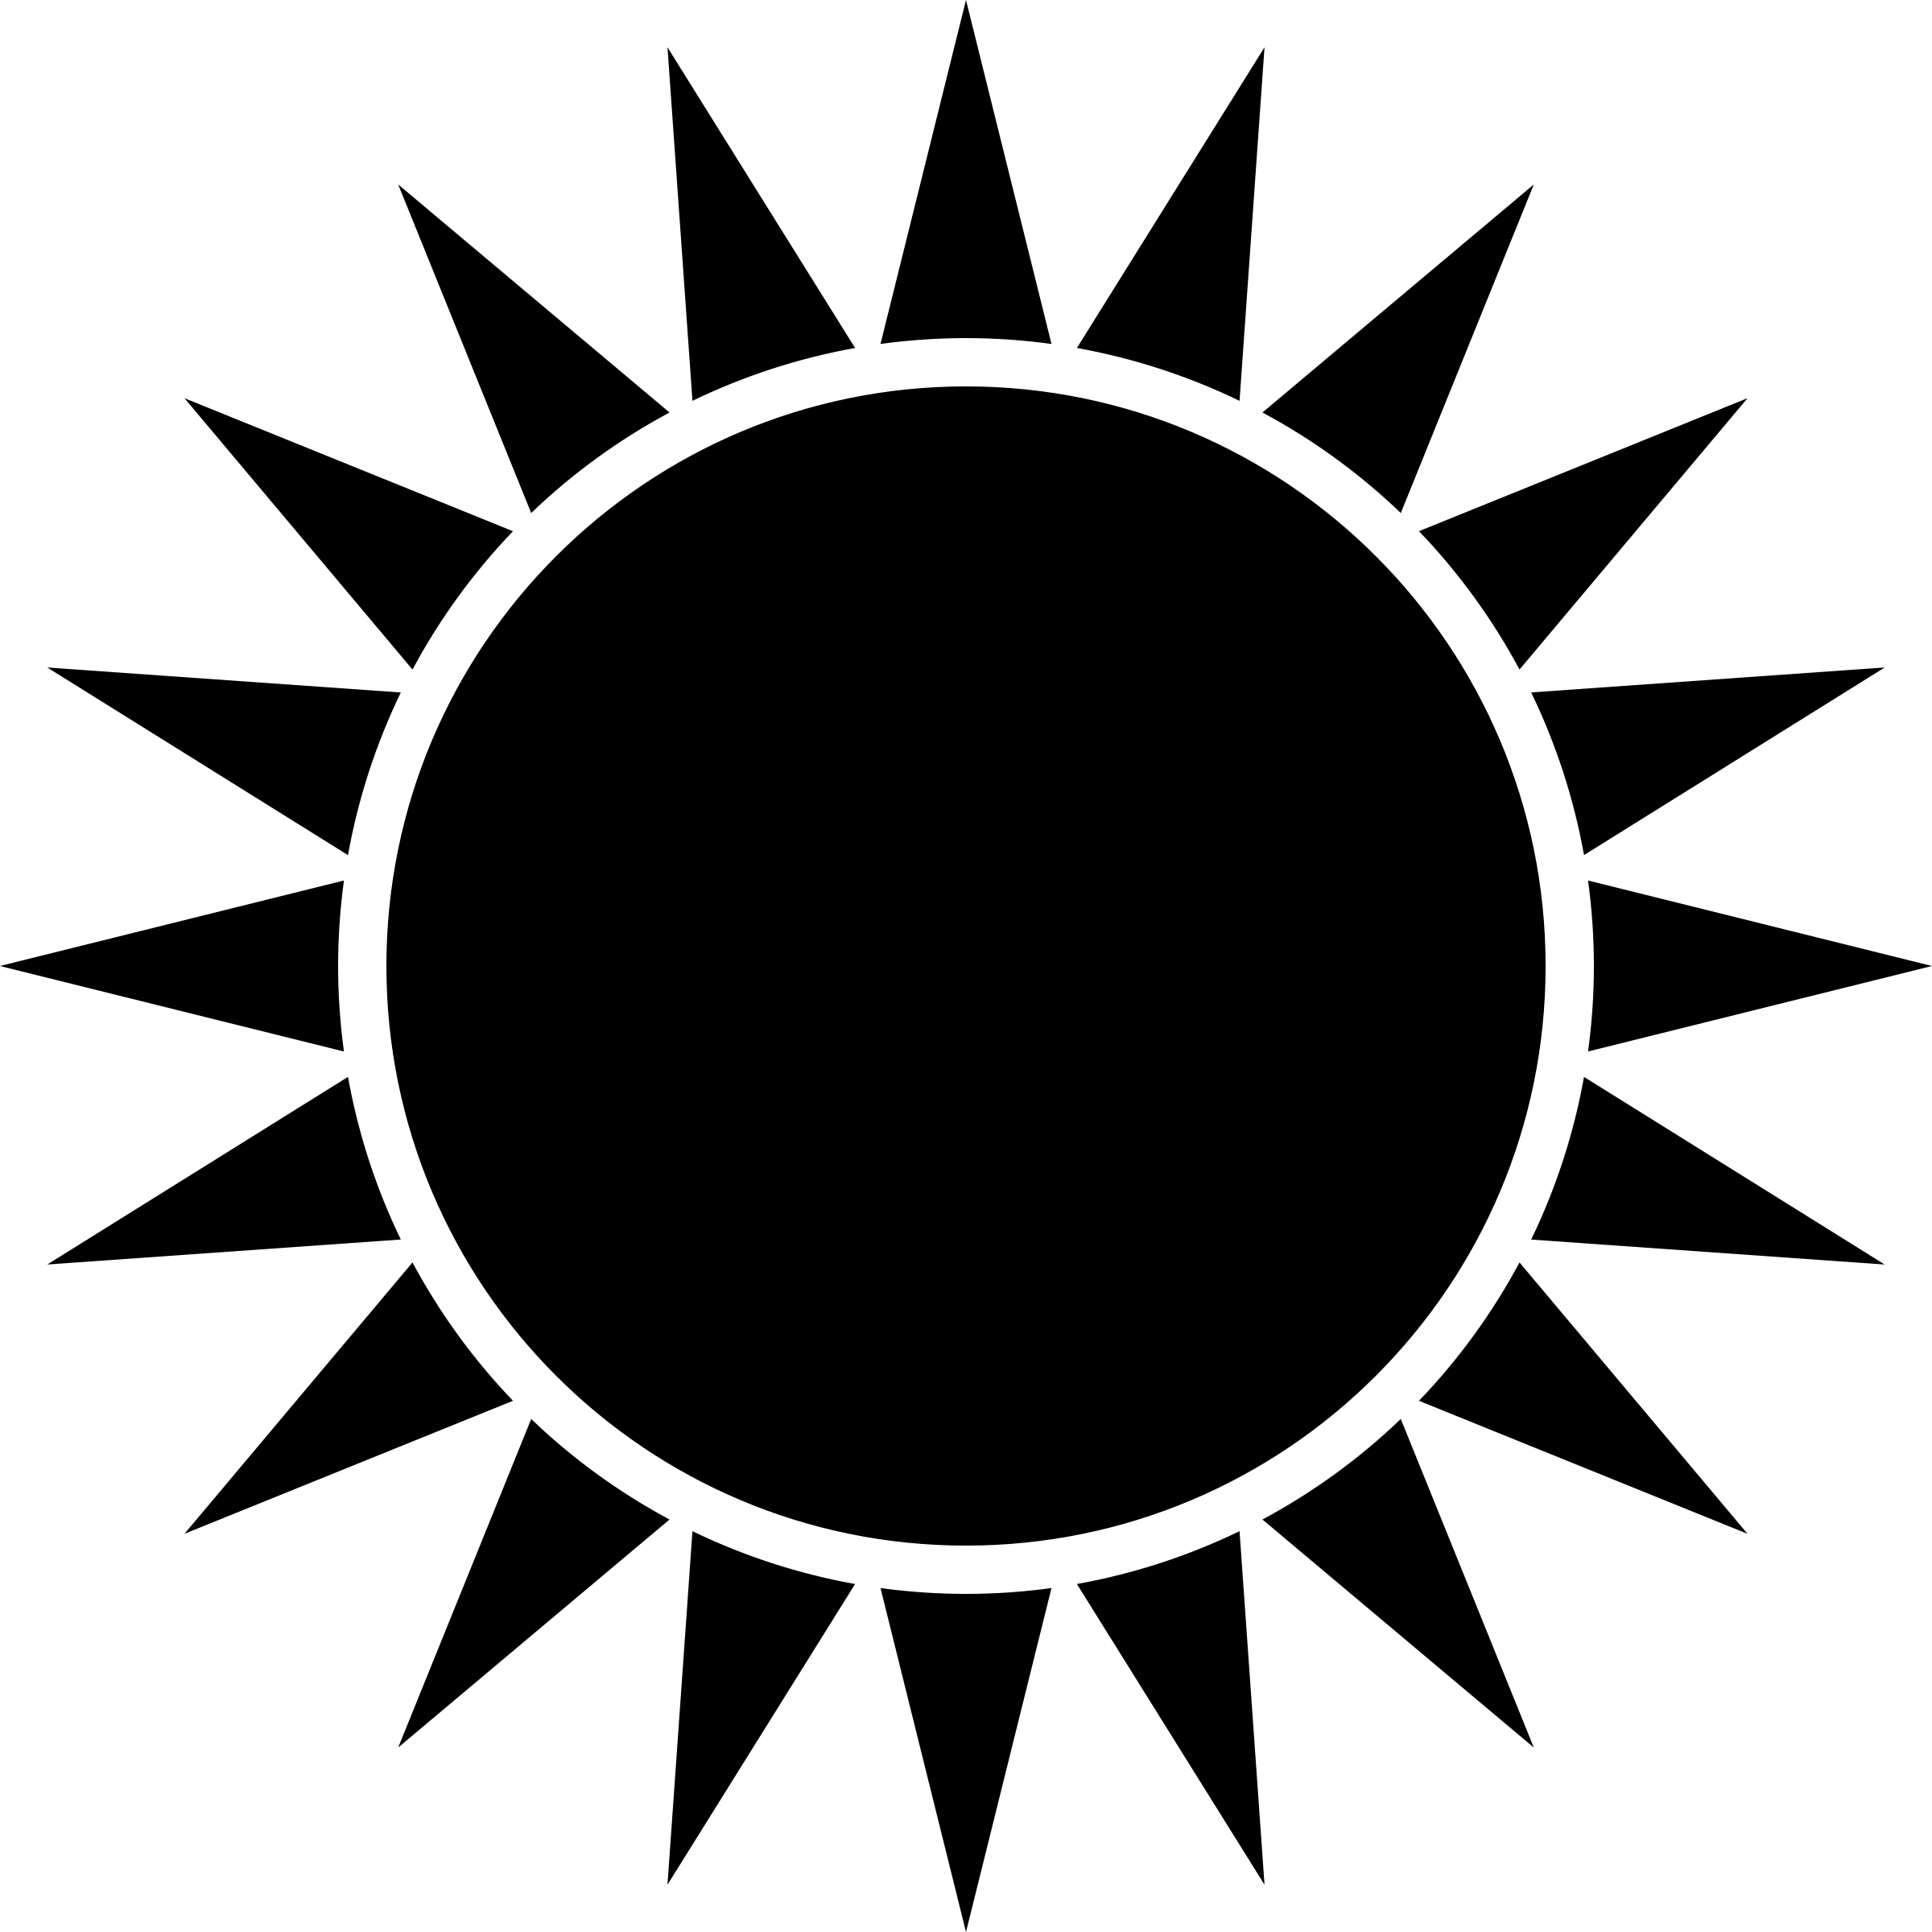 2400x2400 Sun Rays Clipart Transparent